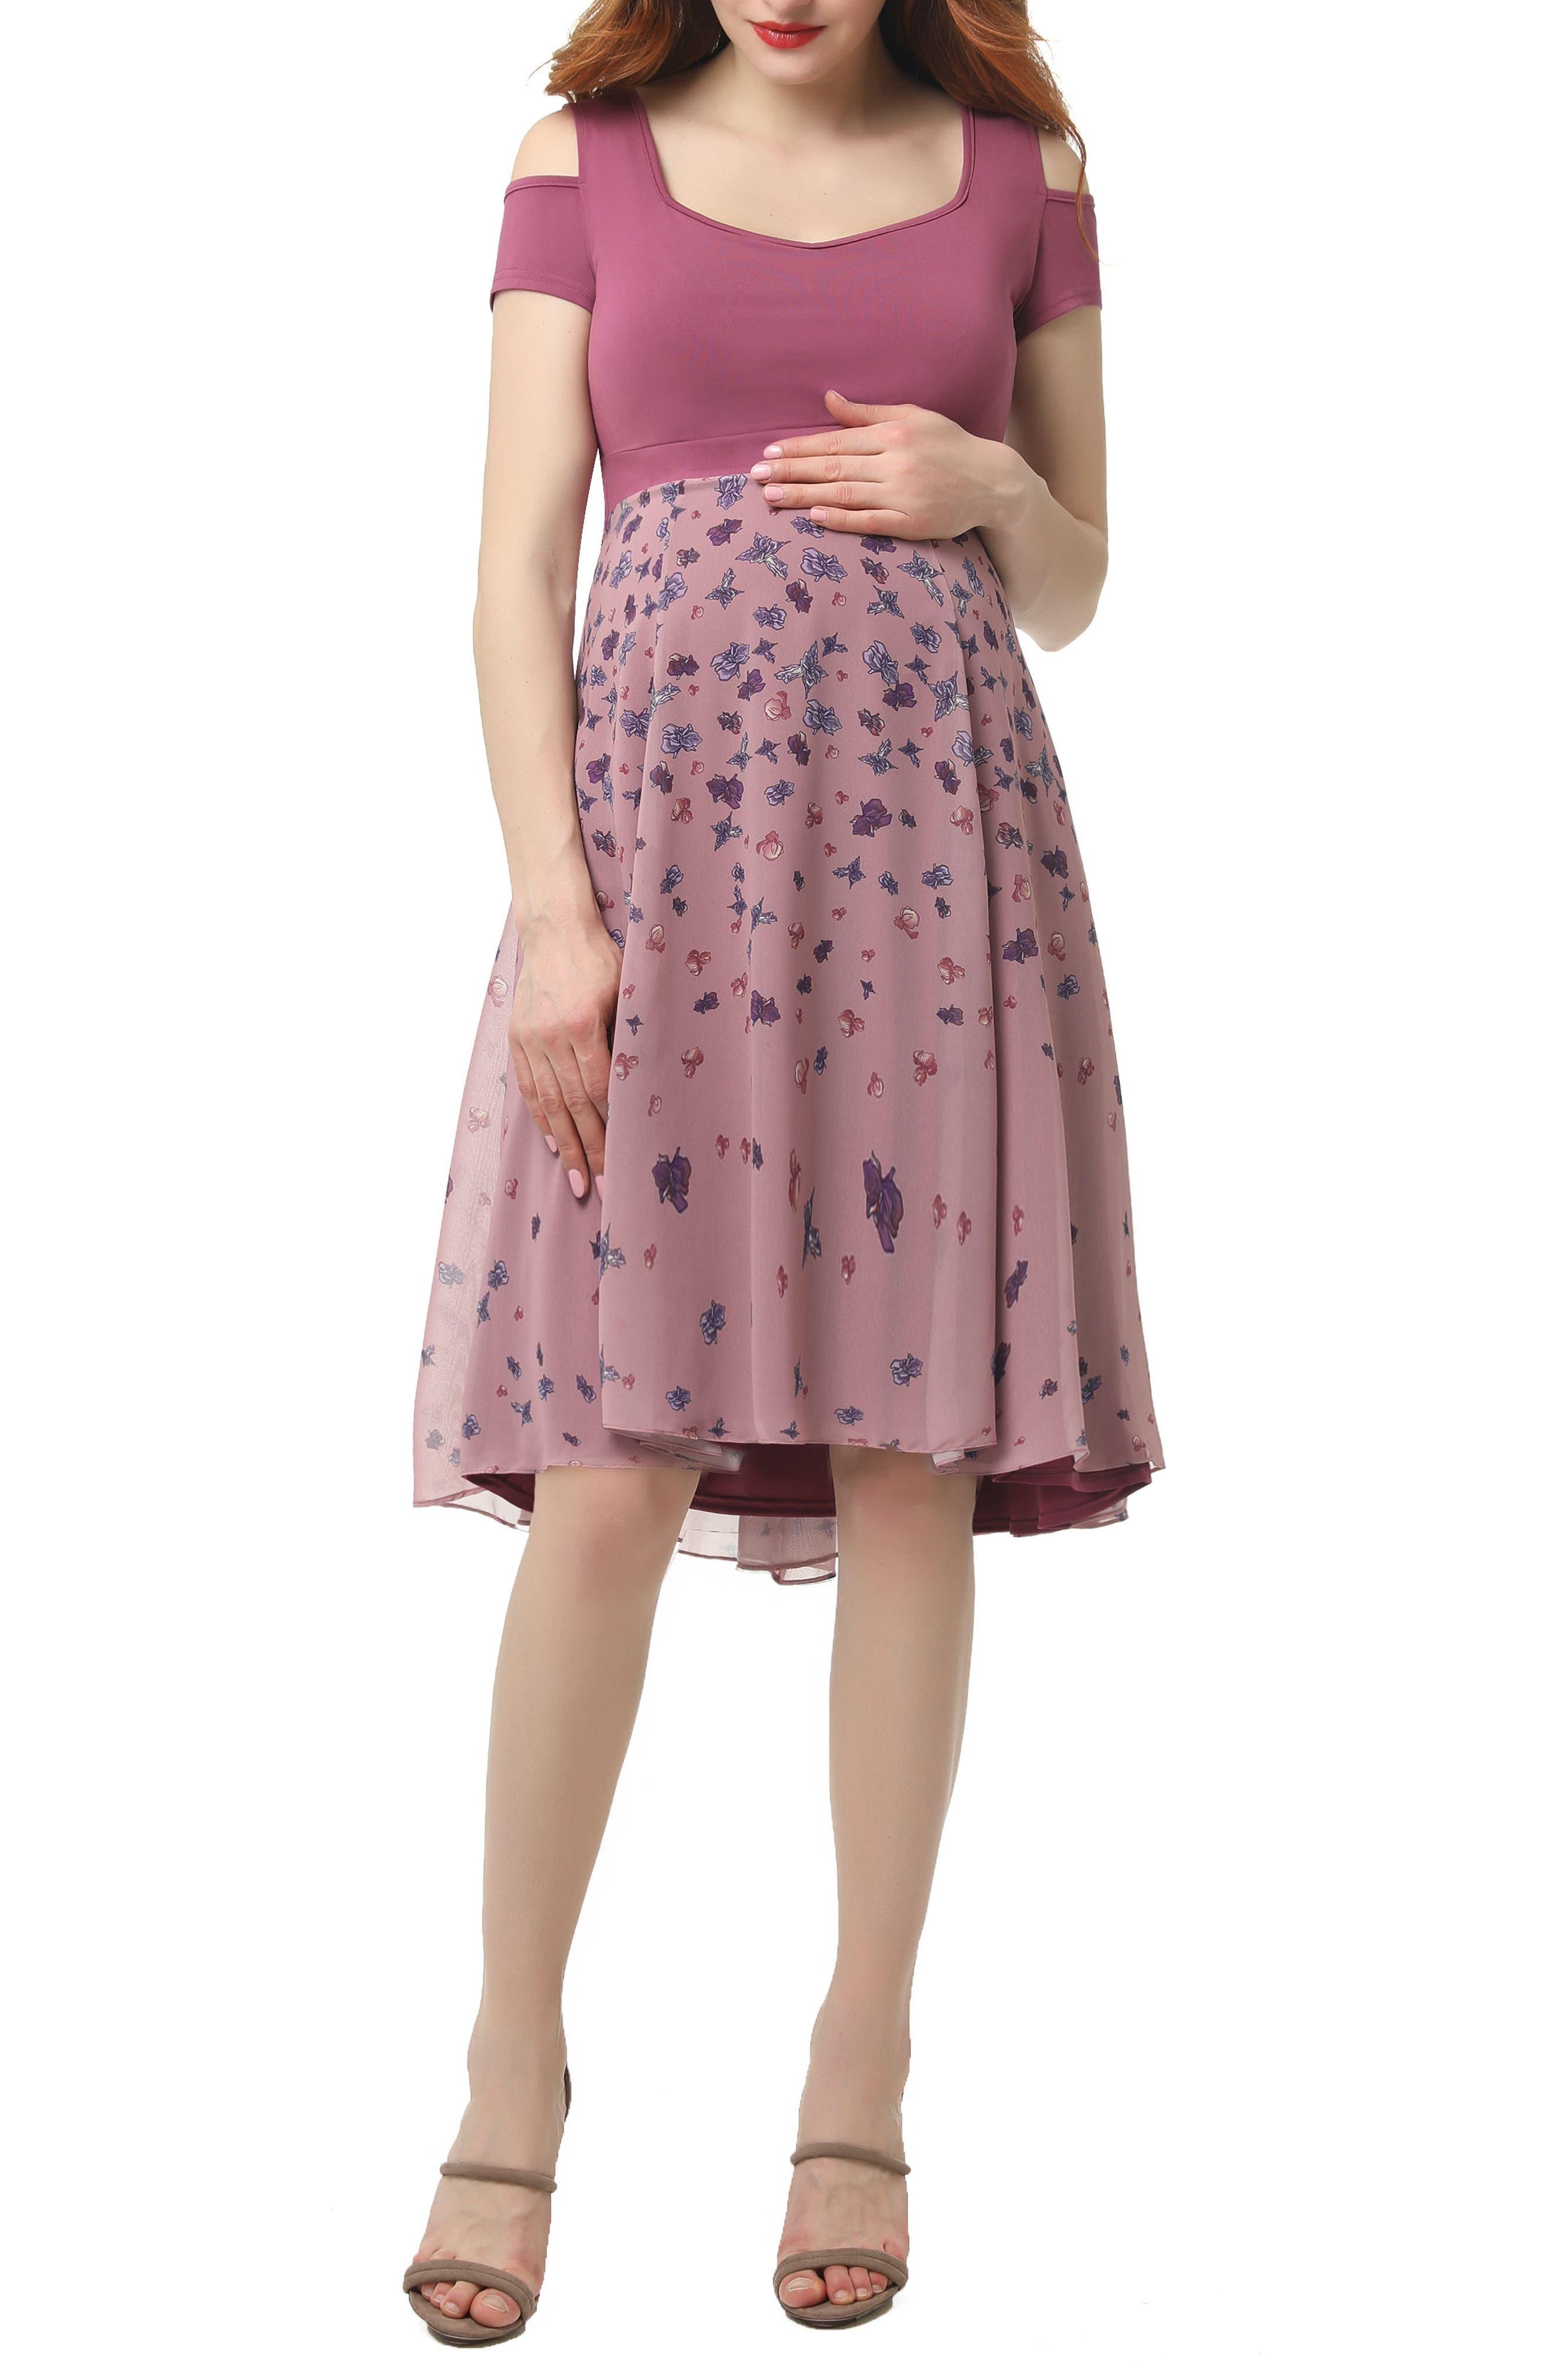 KIMI AND KAI, Erica Cold Shoulder Maternity Dress, Main thumbnail 1, color, ROSE PINK